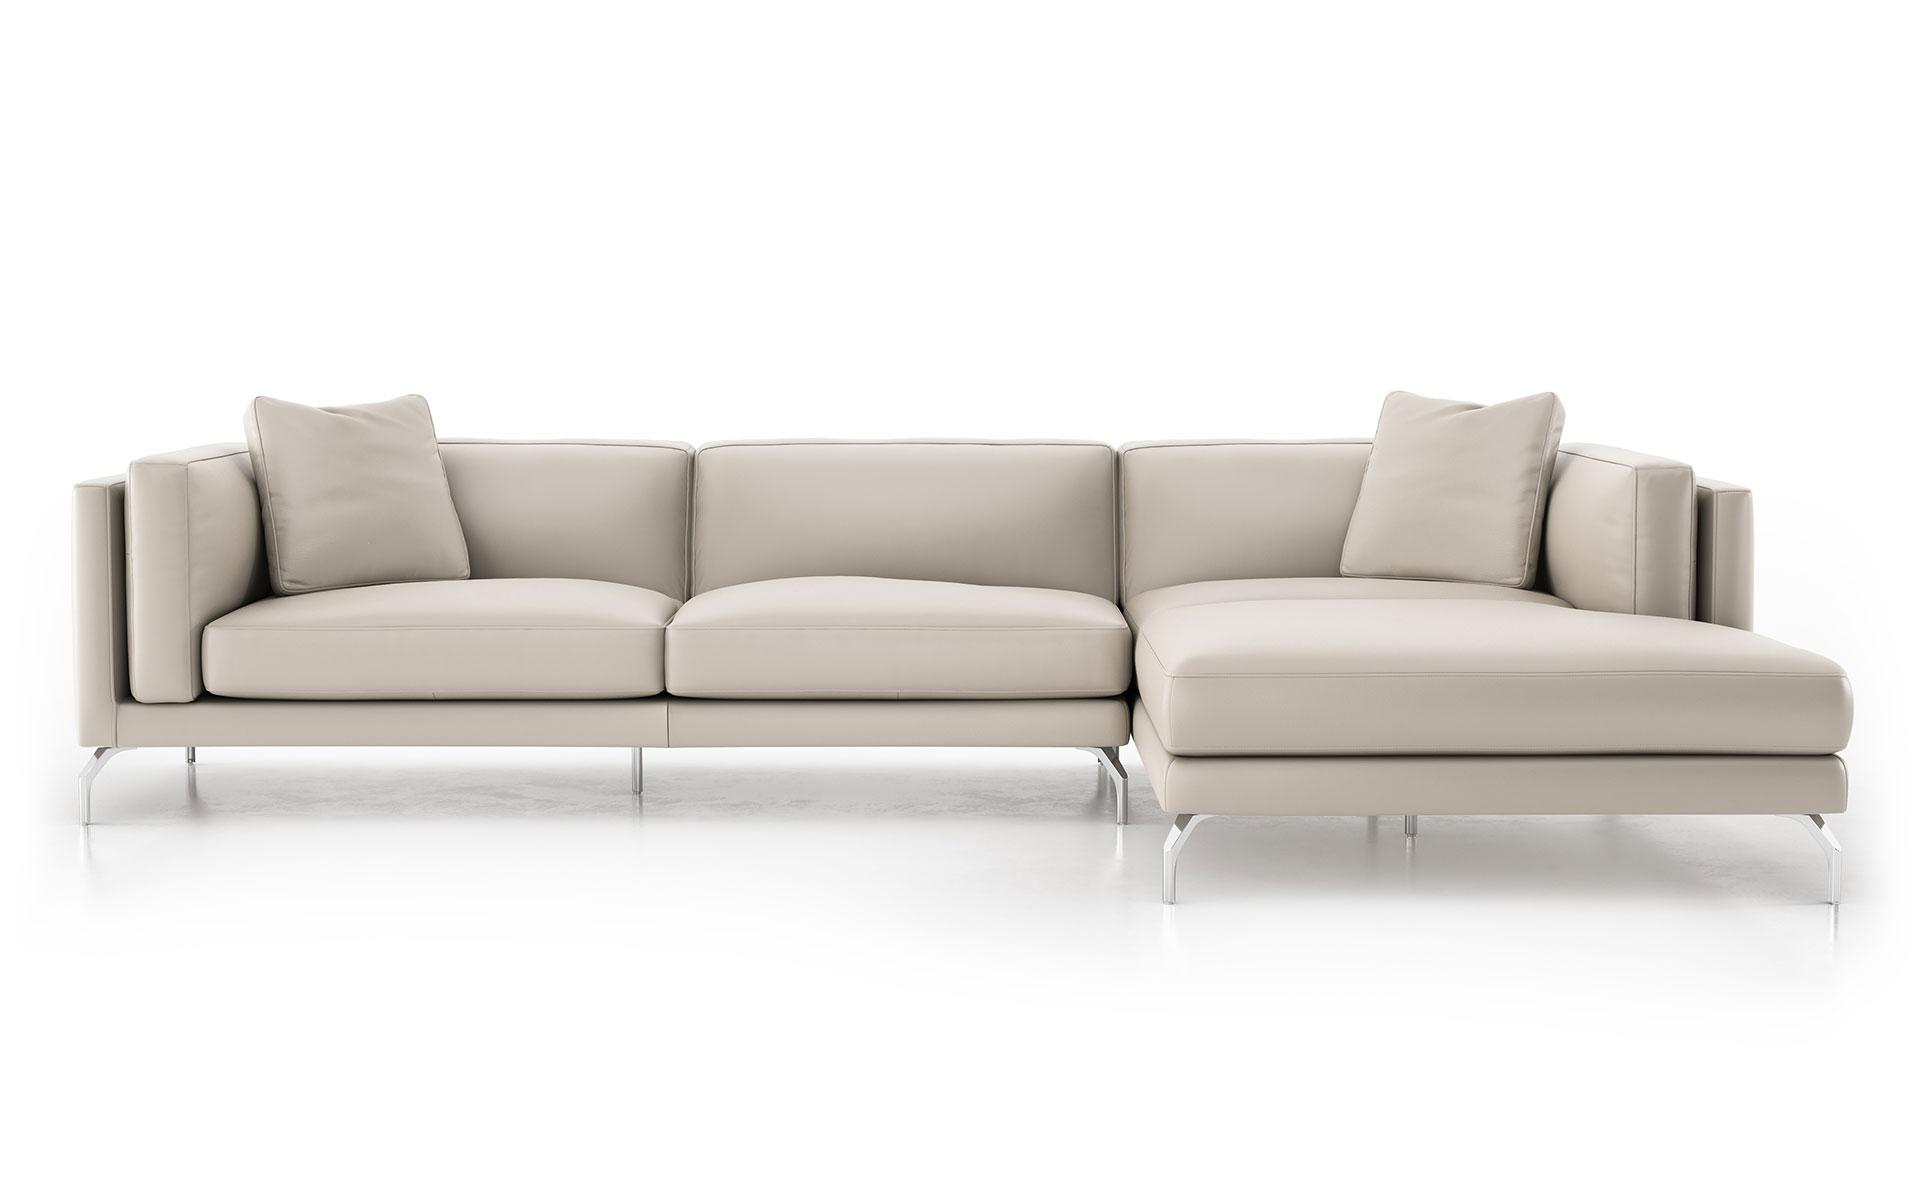 Reade Sectional Sofa